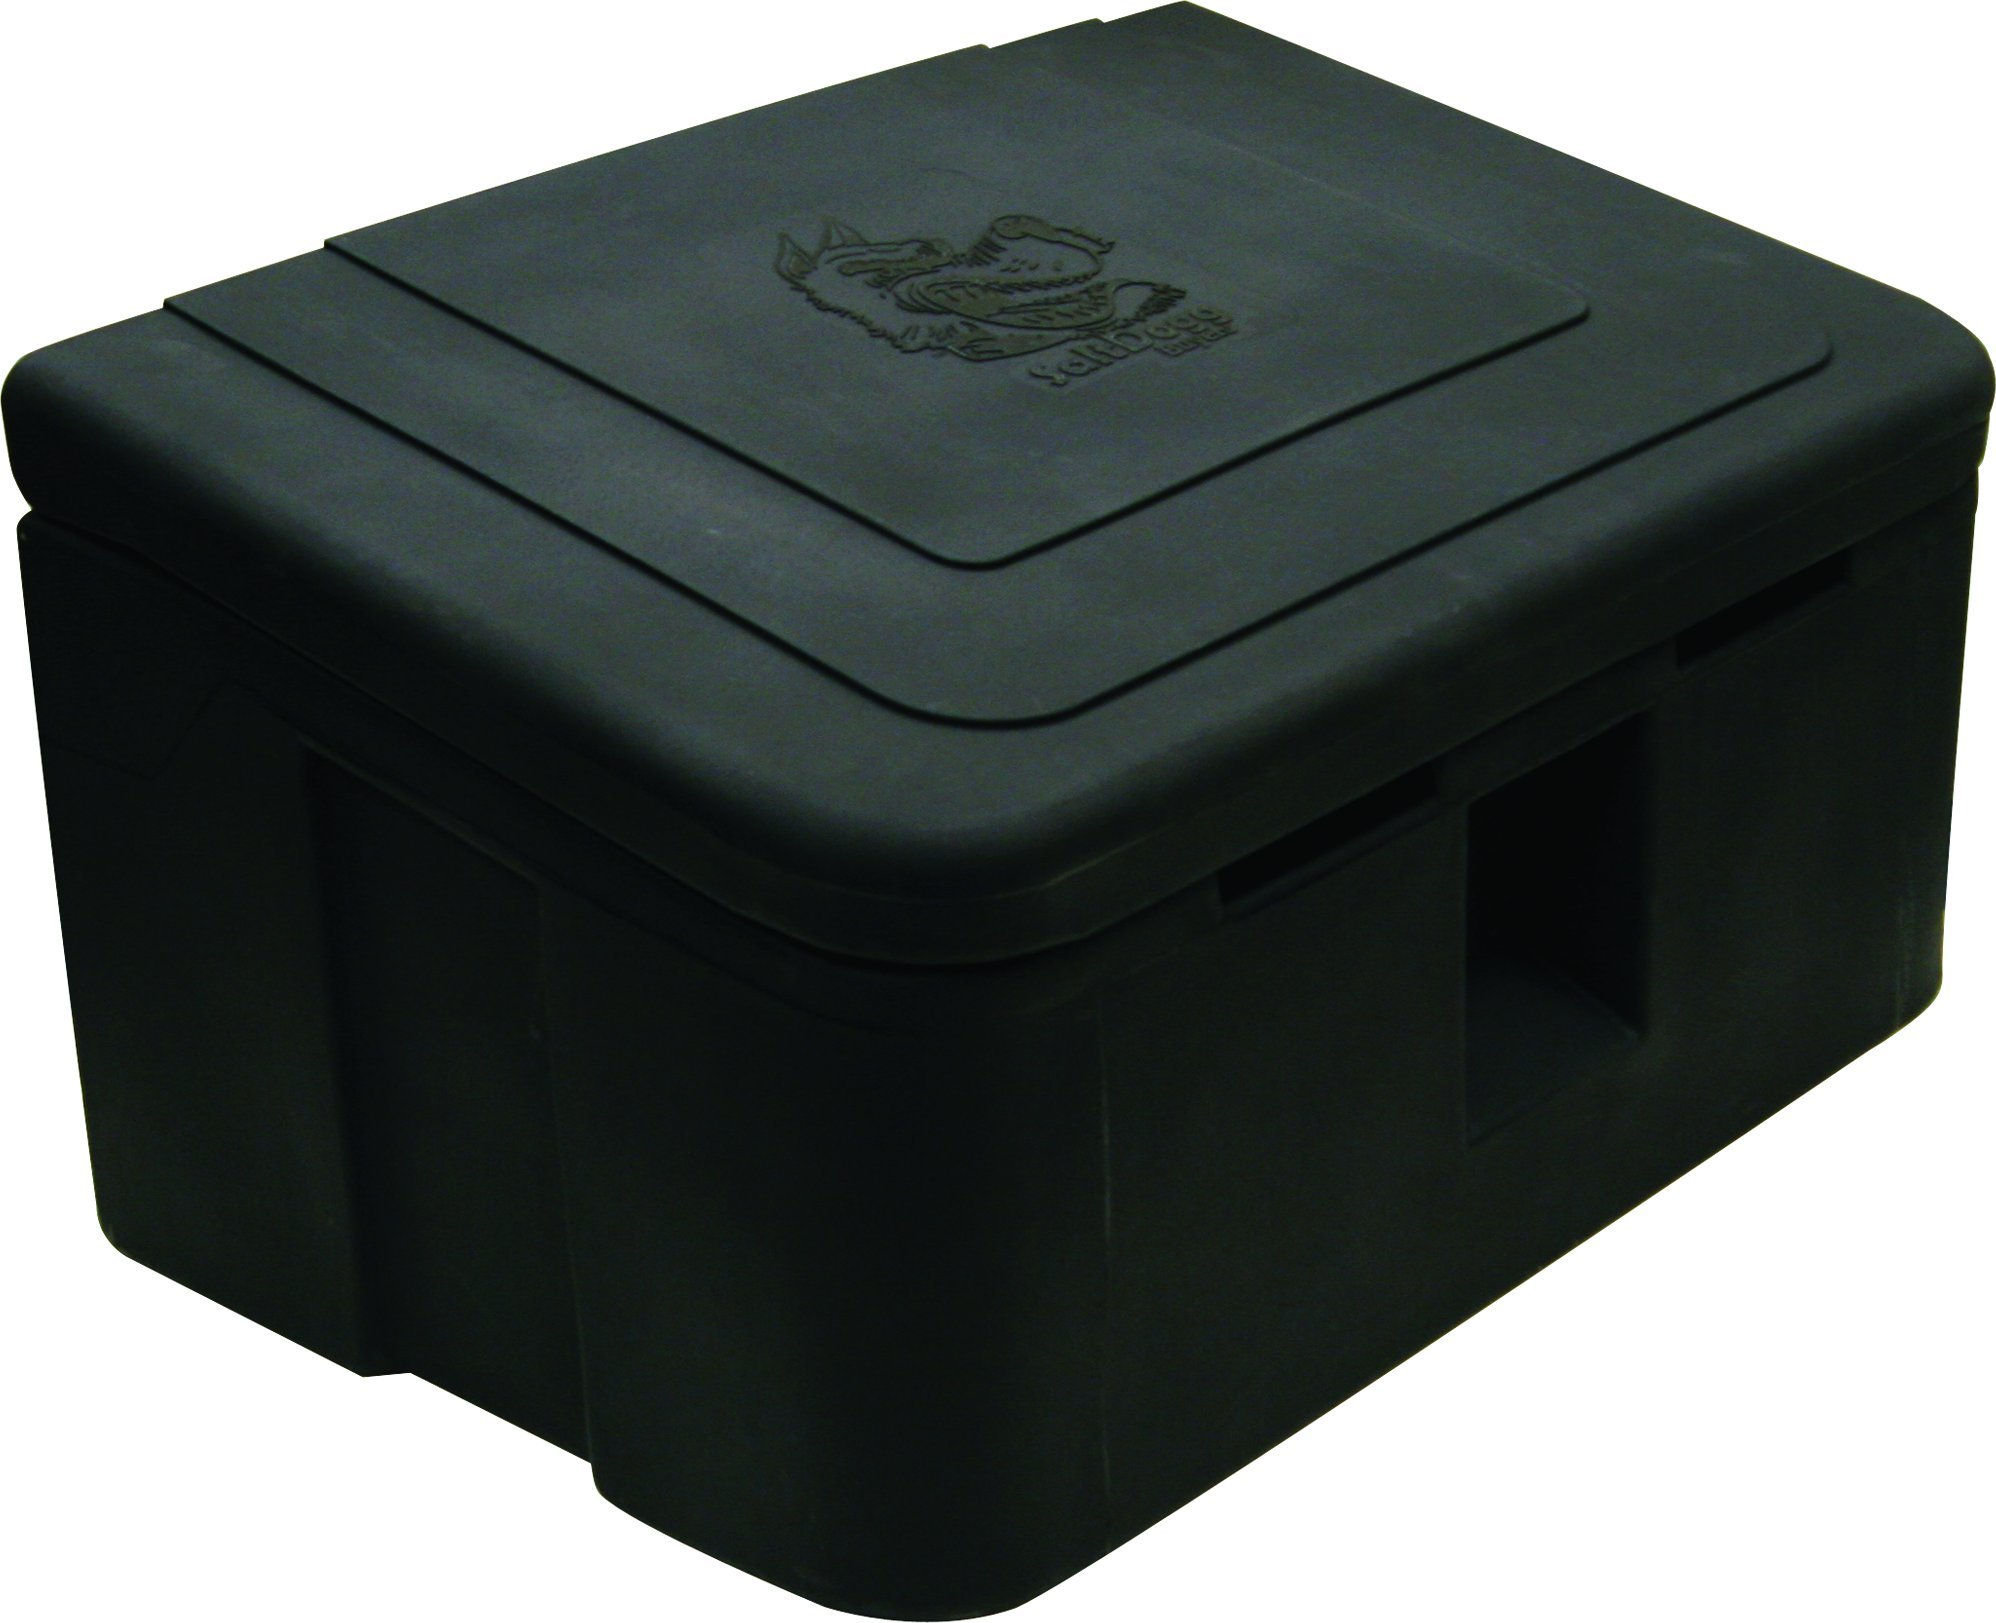 Buyers Products 9031105 Heavy Duty Poly Storage Bin, 35 Gallon Capacity